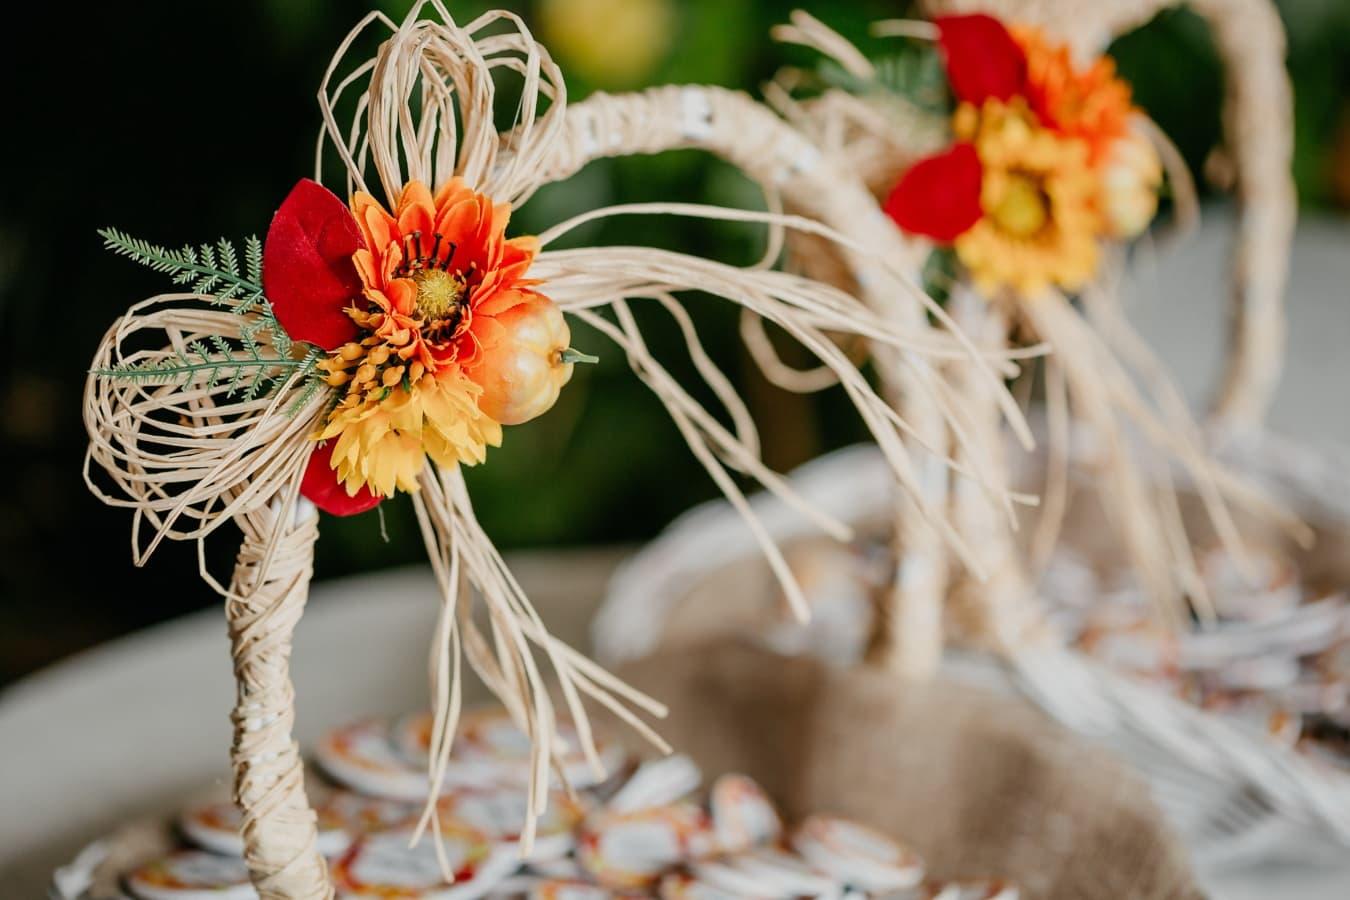 wicker basket, decorative, handmade, still life, flower, decoration, bright, color, traditional, upclose